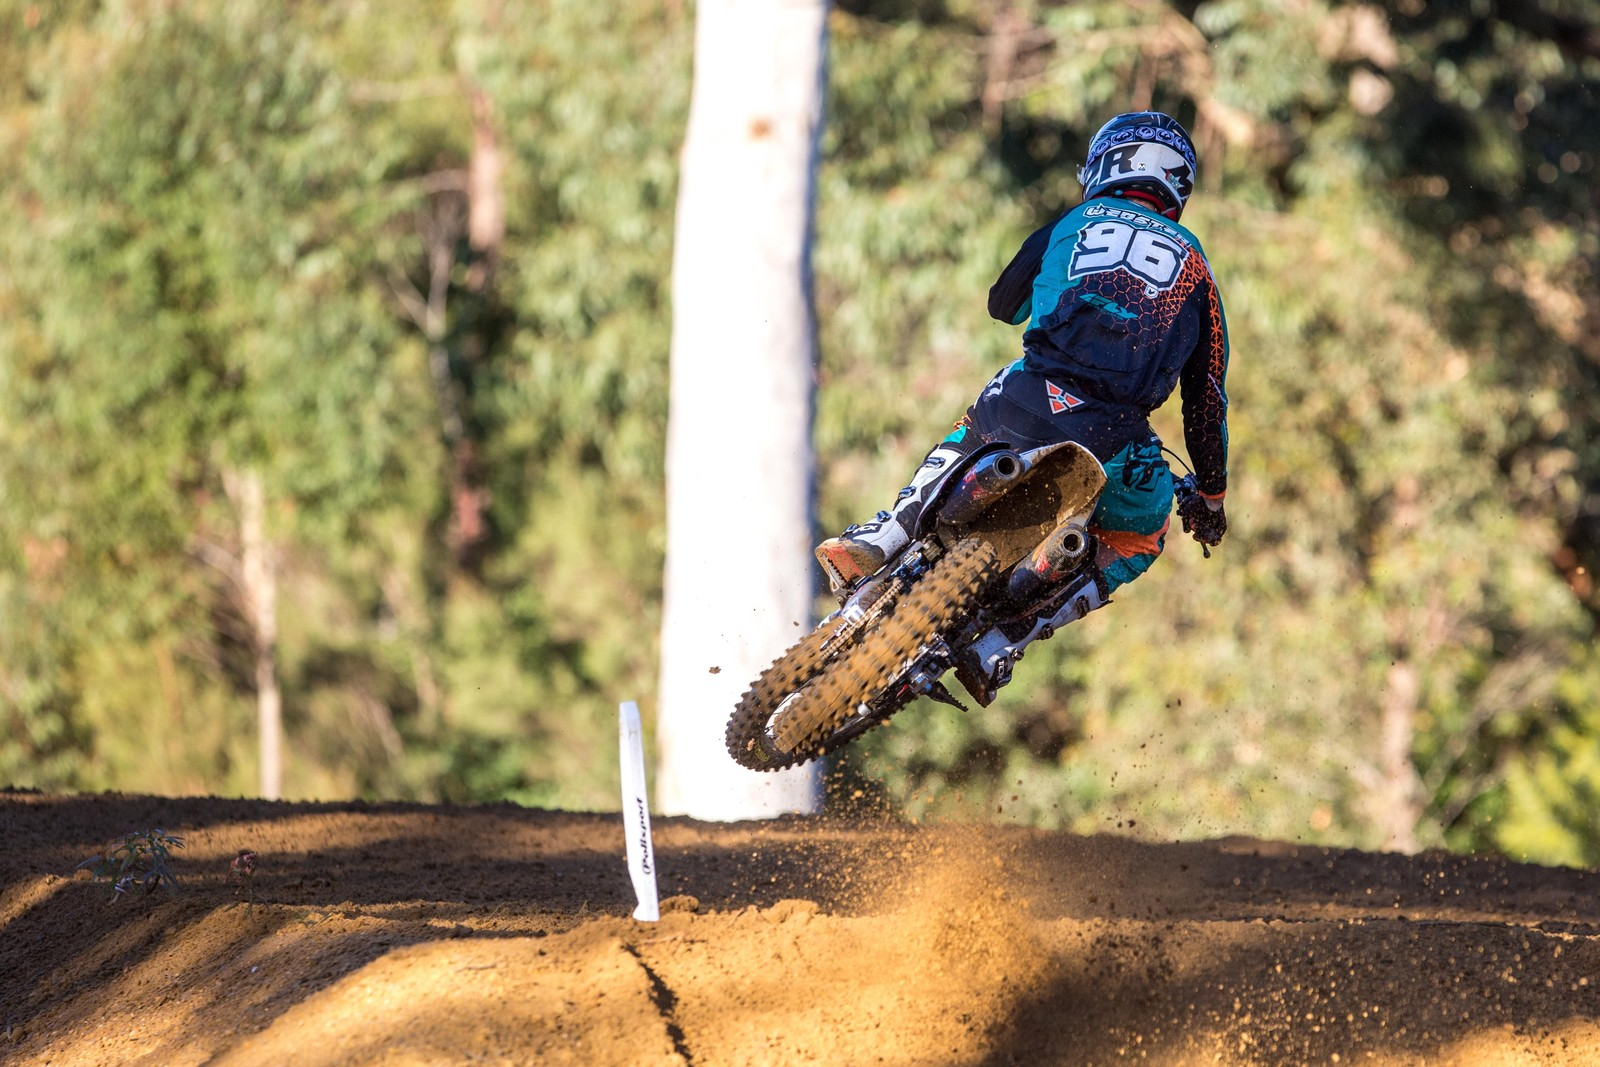 Kyle Webster - Australian Motul MX Championships: Round 6, Nowra - Motocross Pictures - Vital MX